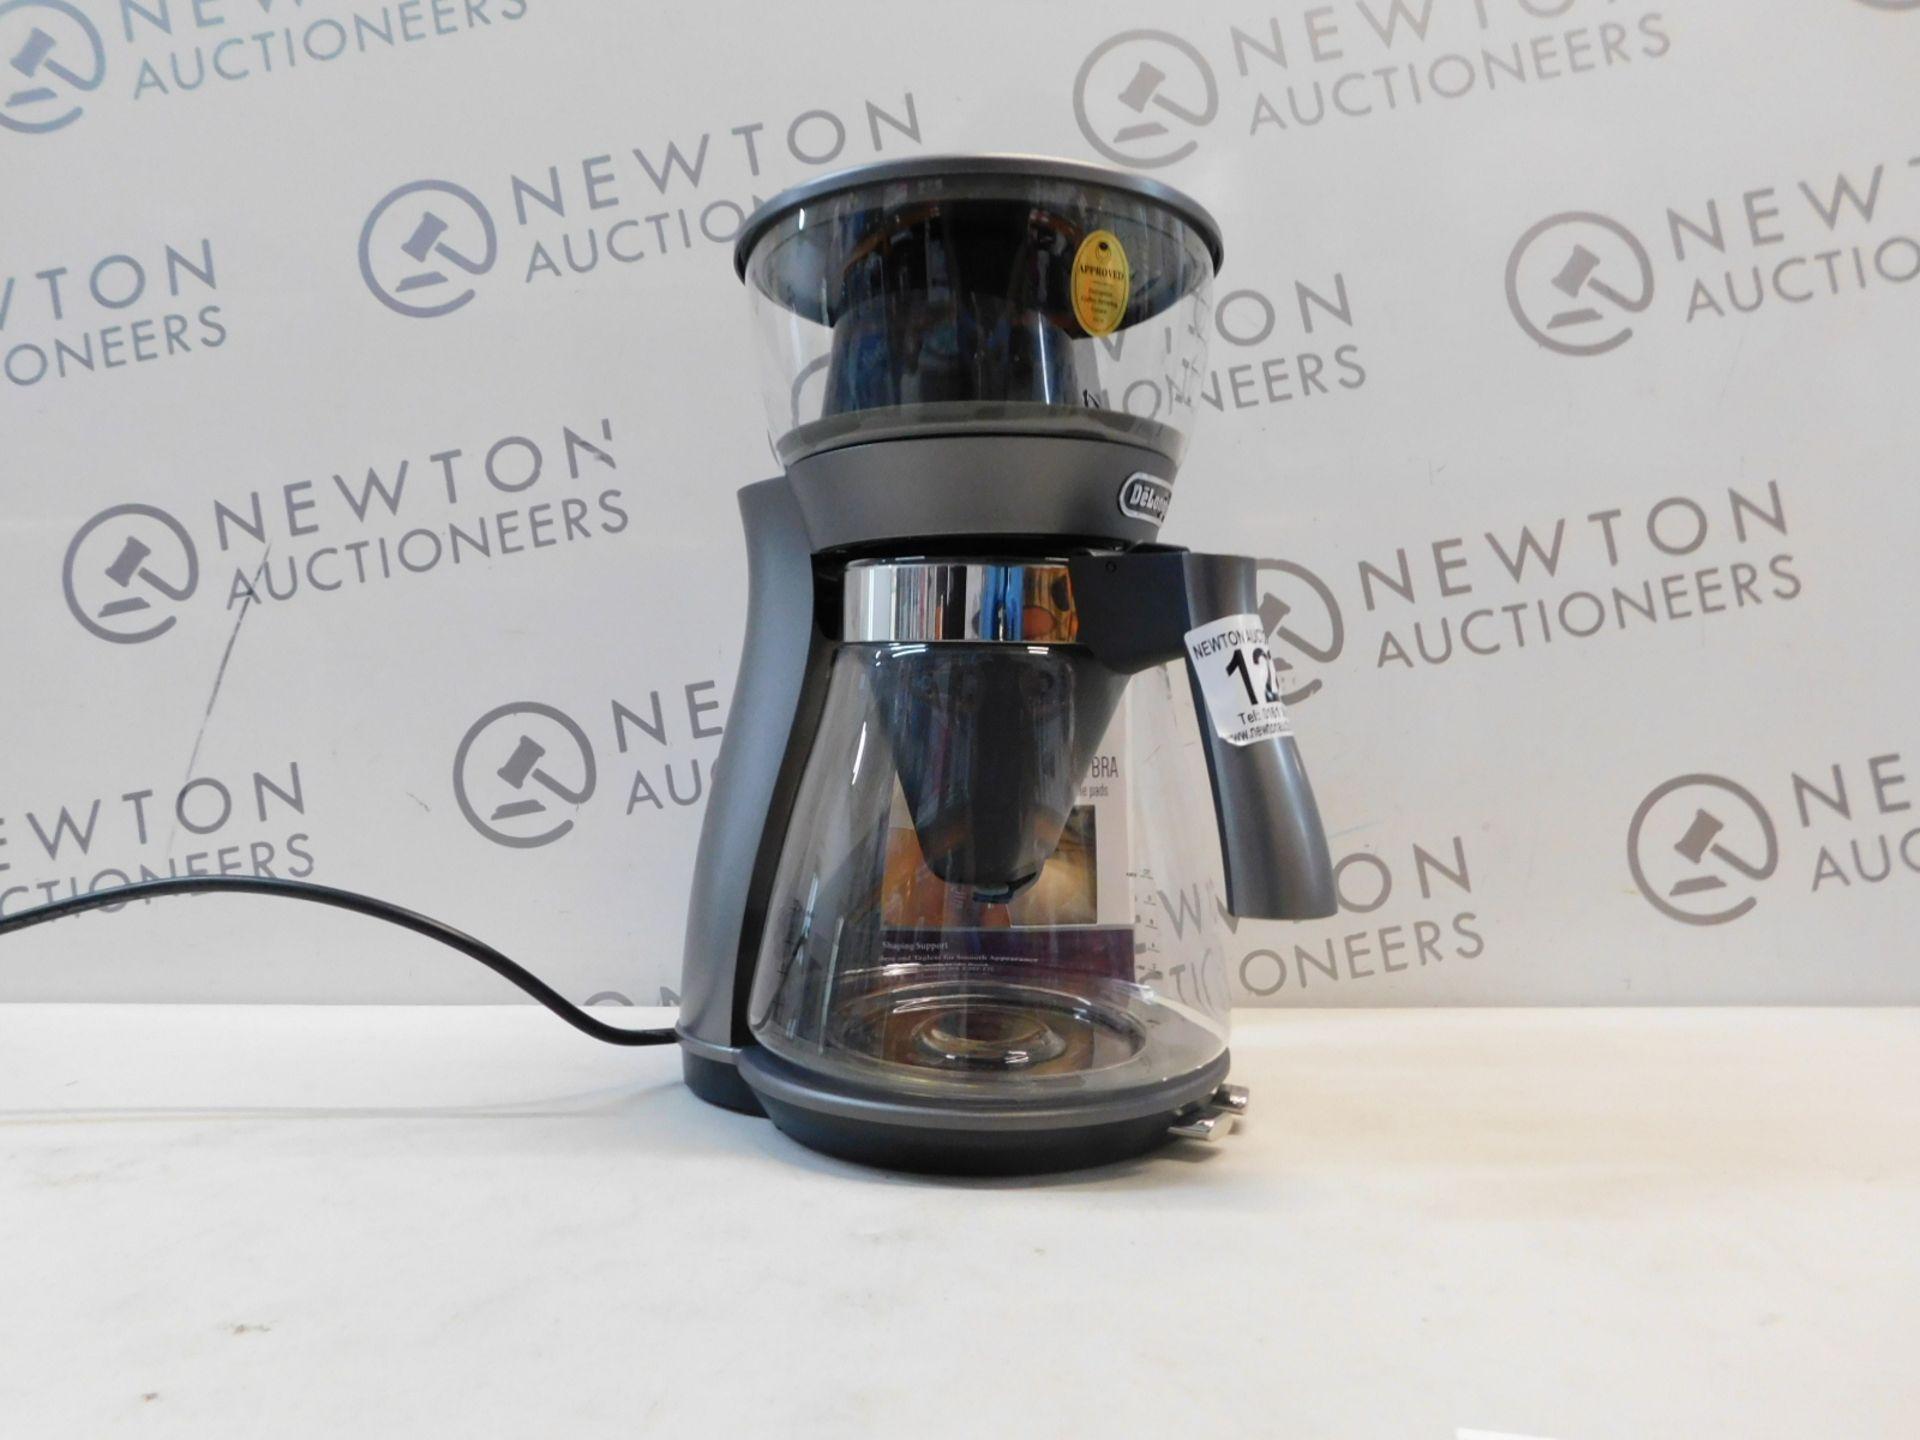 1 DELONGHI CLESSIDRA ICM17210 FILTER COFFEE MACHINE RRP £159